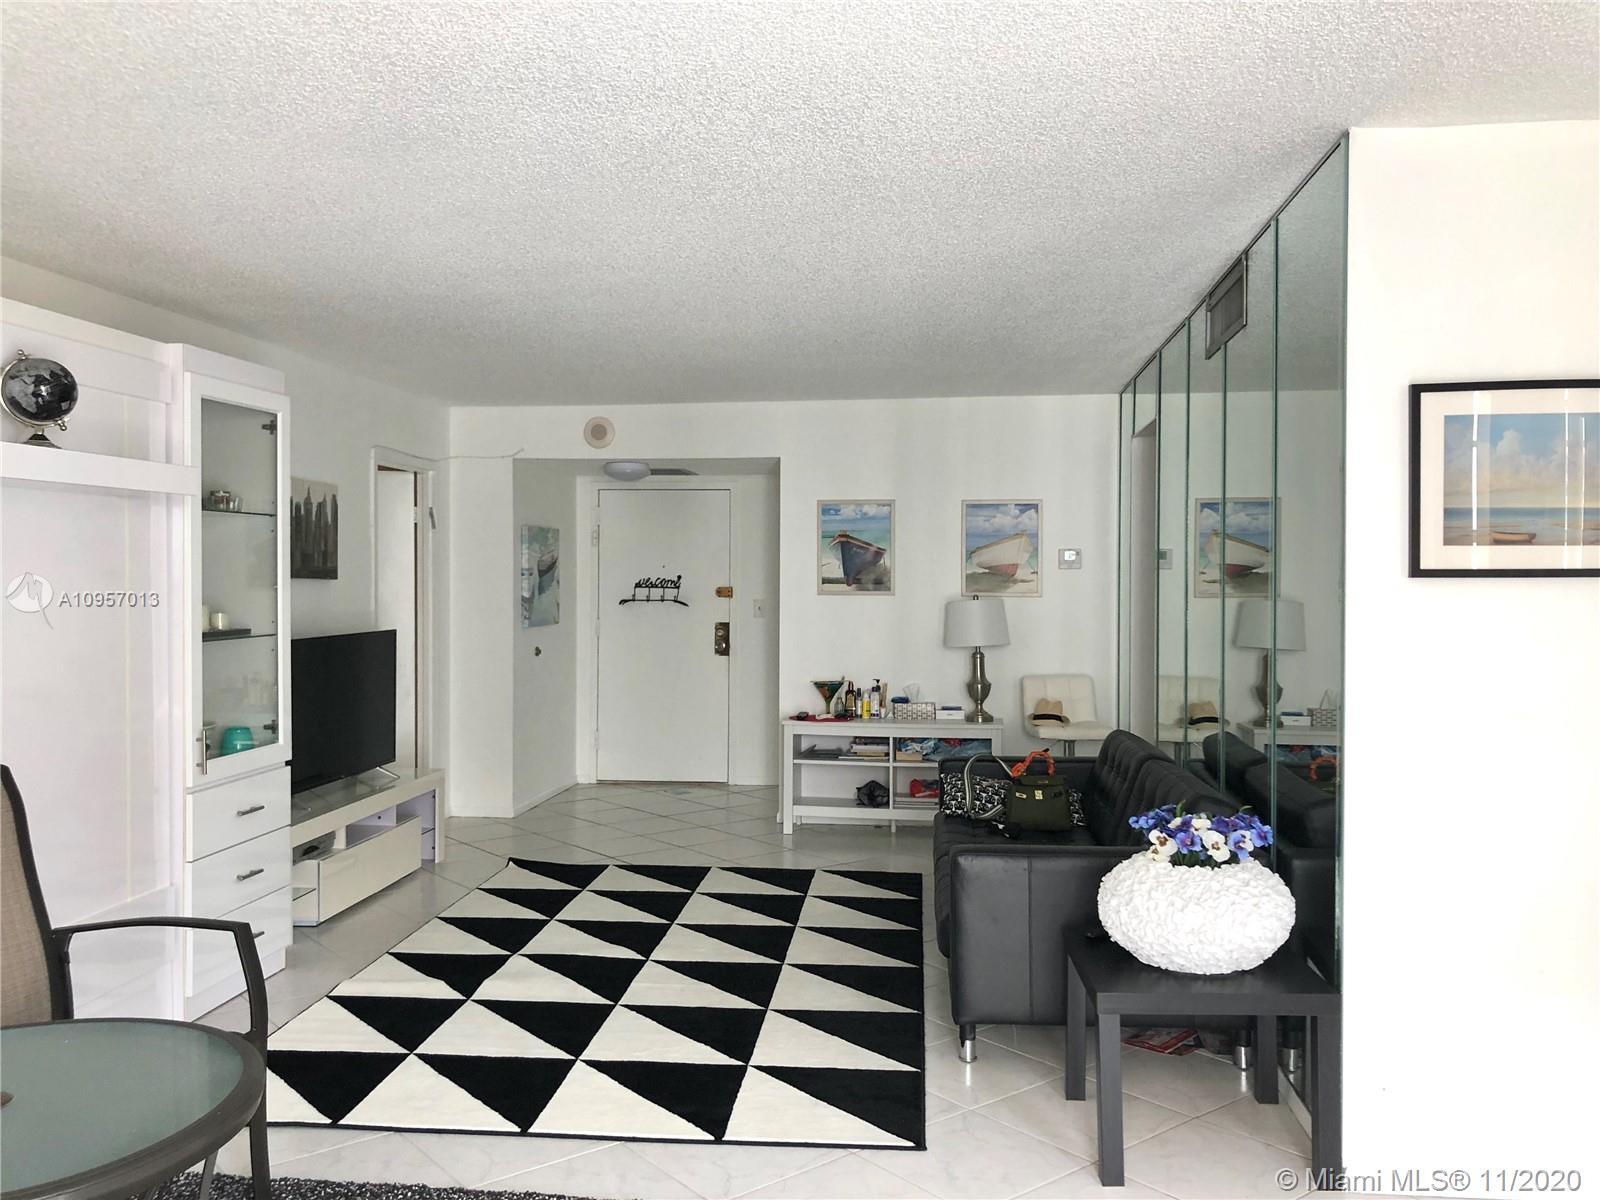 Winston Tower 400 #1611 - 231 174th St #1611, Sunny Isles Beach, FL 33160